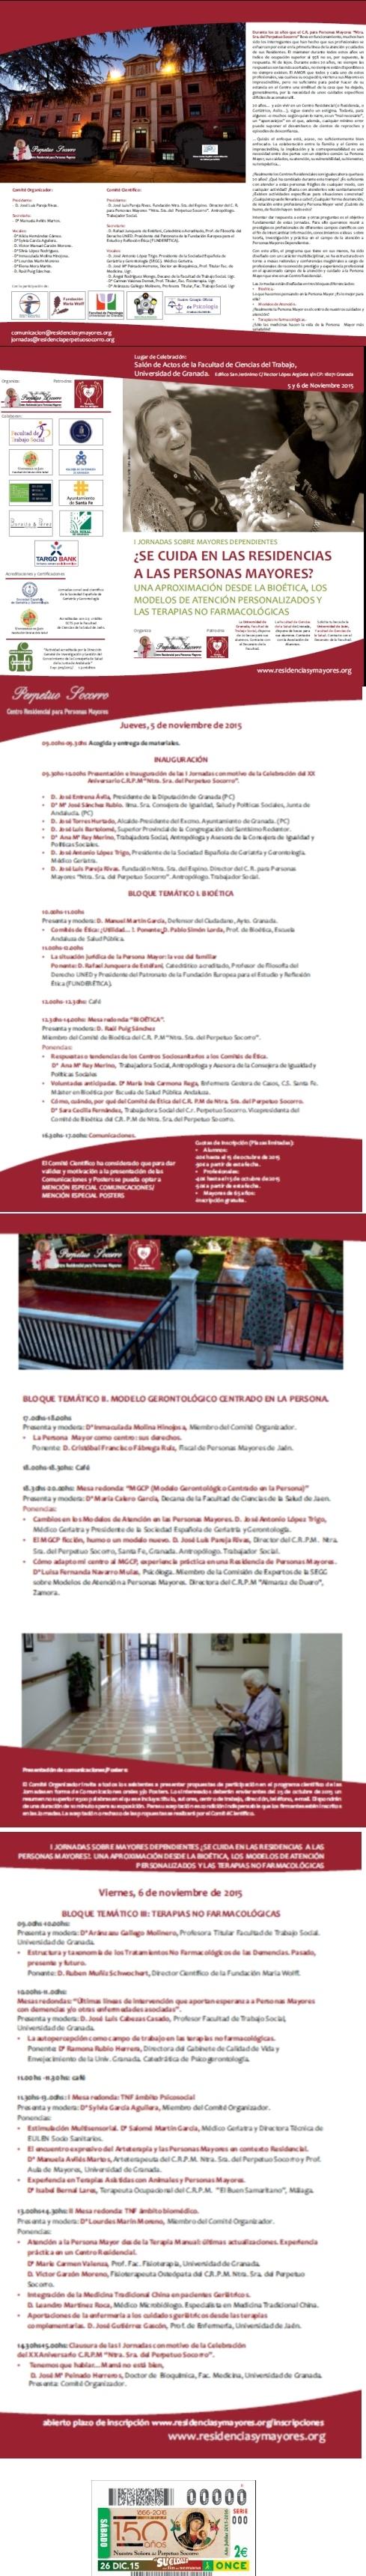 20151117062525-santa-fe-jornadas-programa-2015.jpg